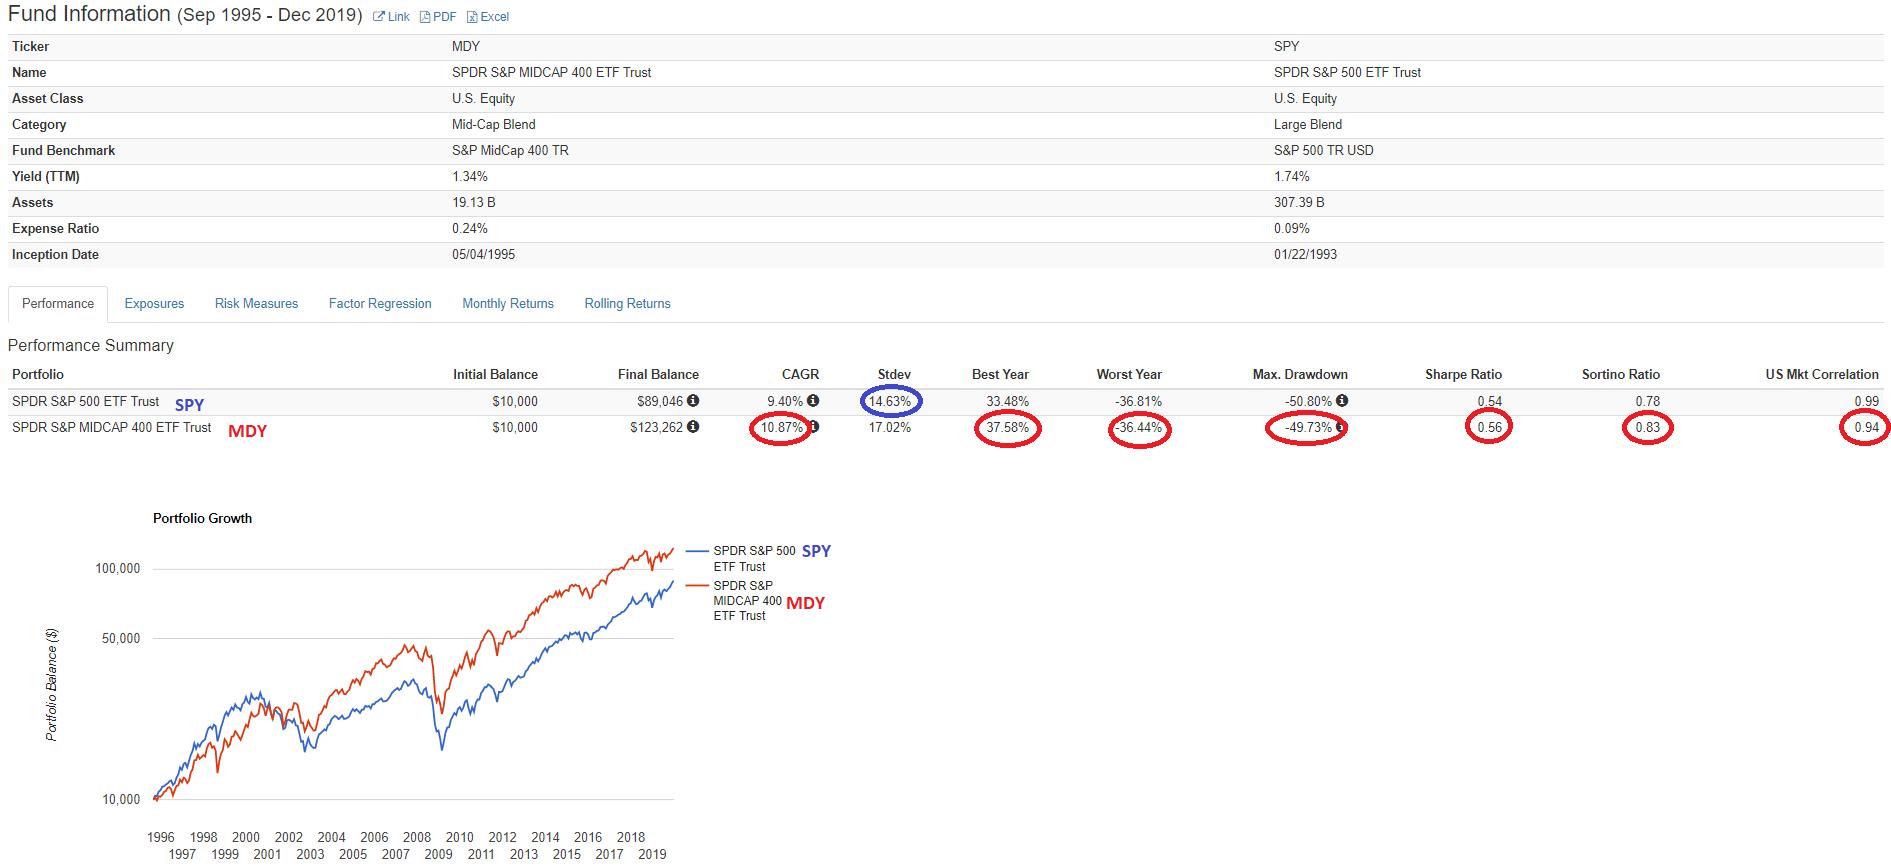 https://i0.wp.com/deepvalueetfaccumulator.com/wp-content/uploads/2020/01/MDY-SPY-SEP-1995-DEC-2019.png?ssl=1